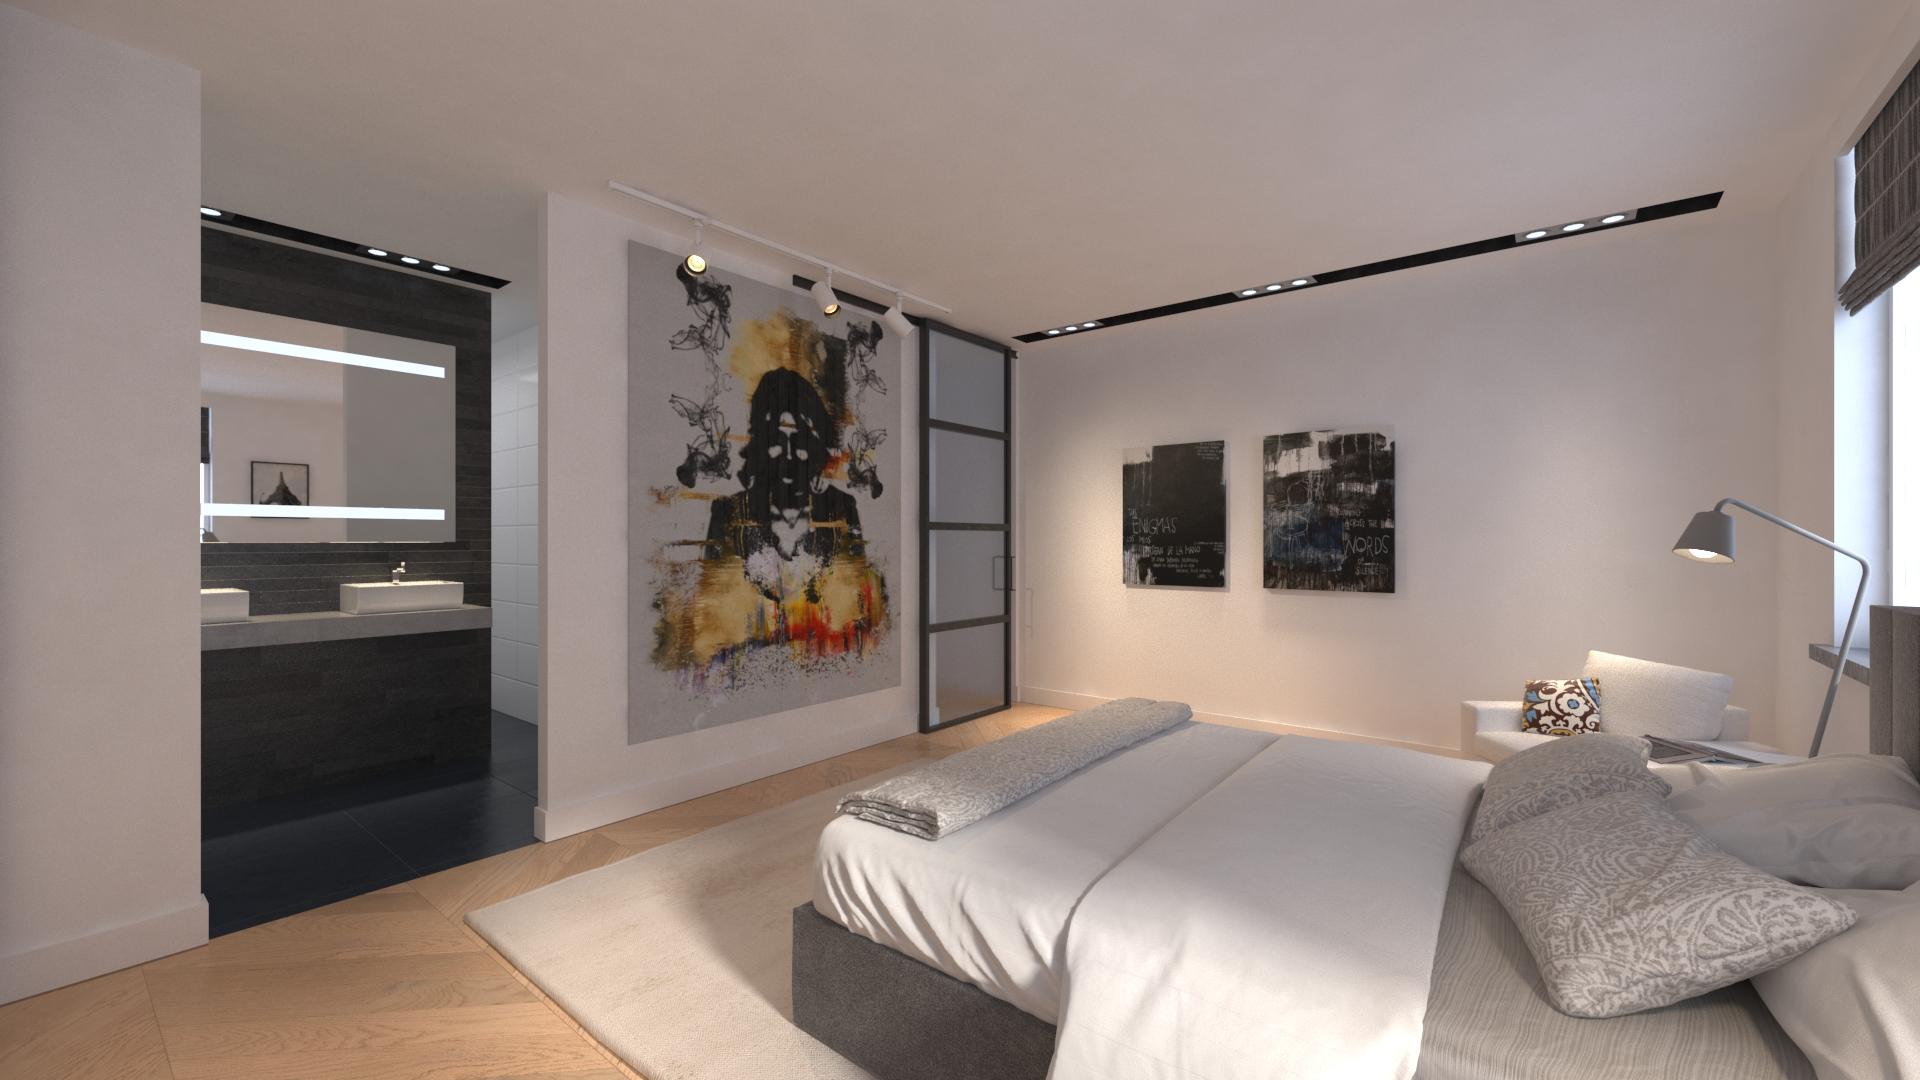 Carnisserhoeck slaapkamer